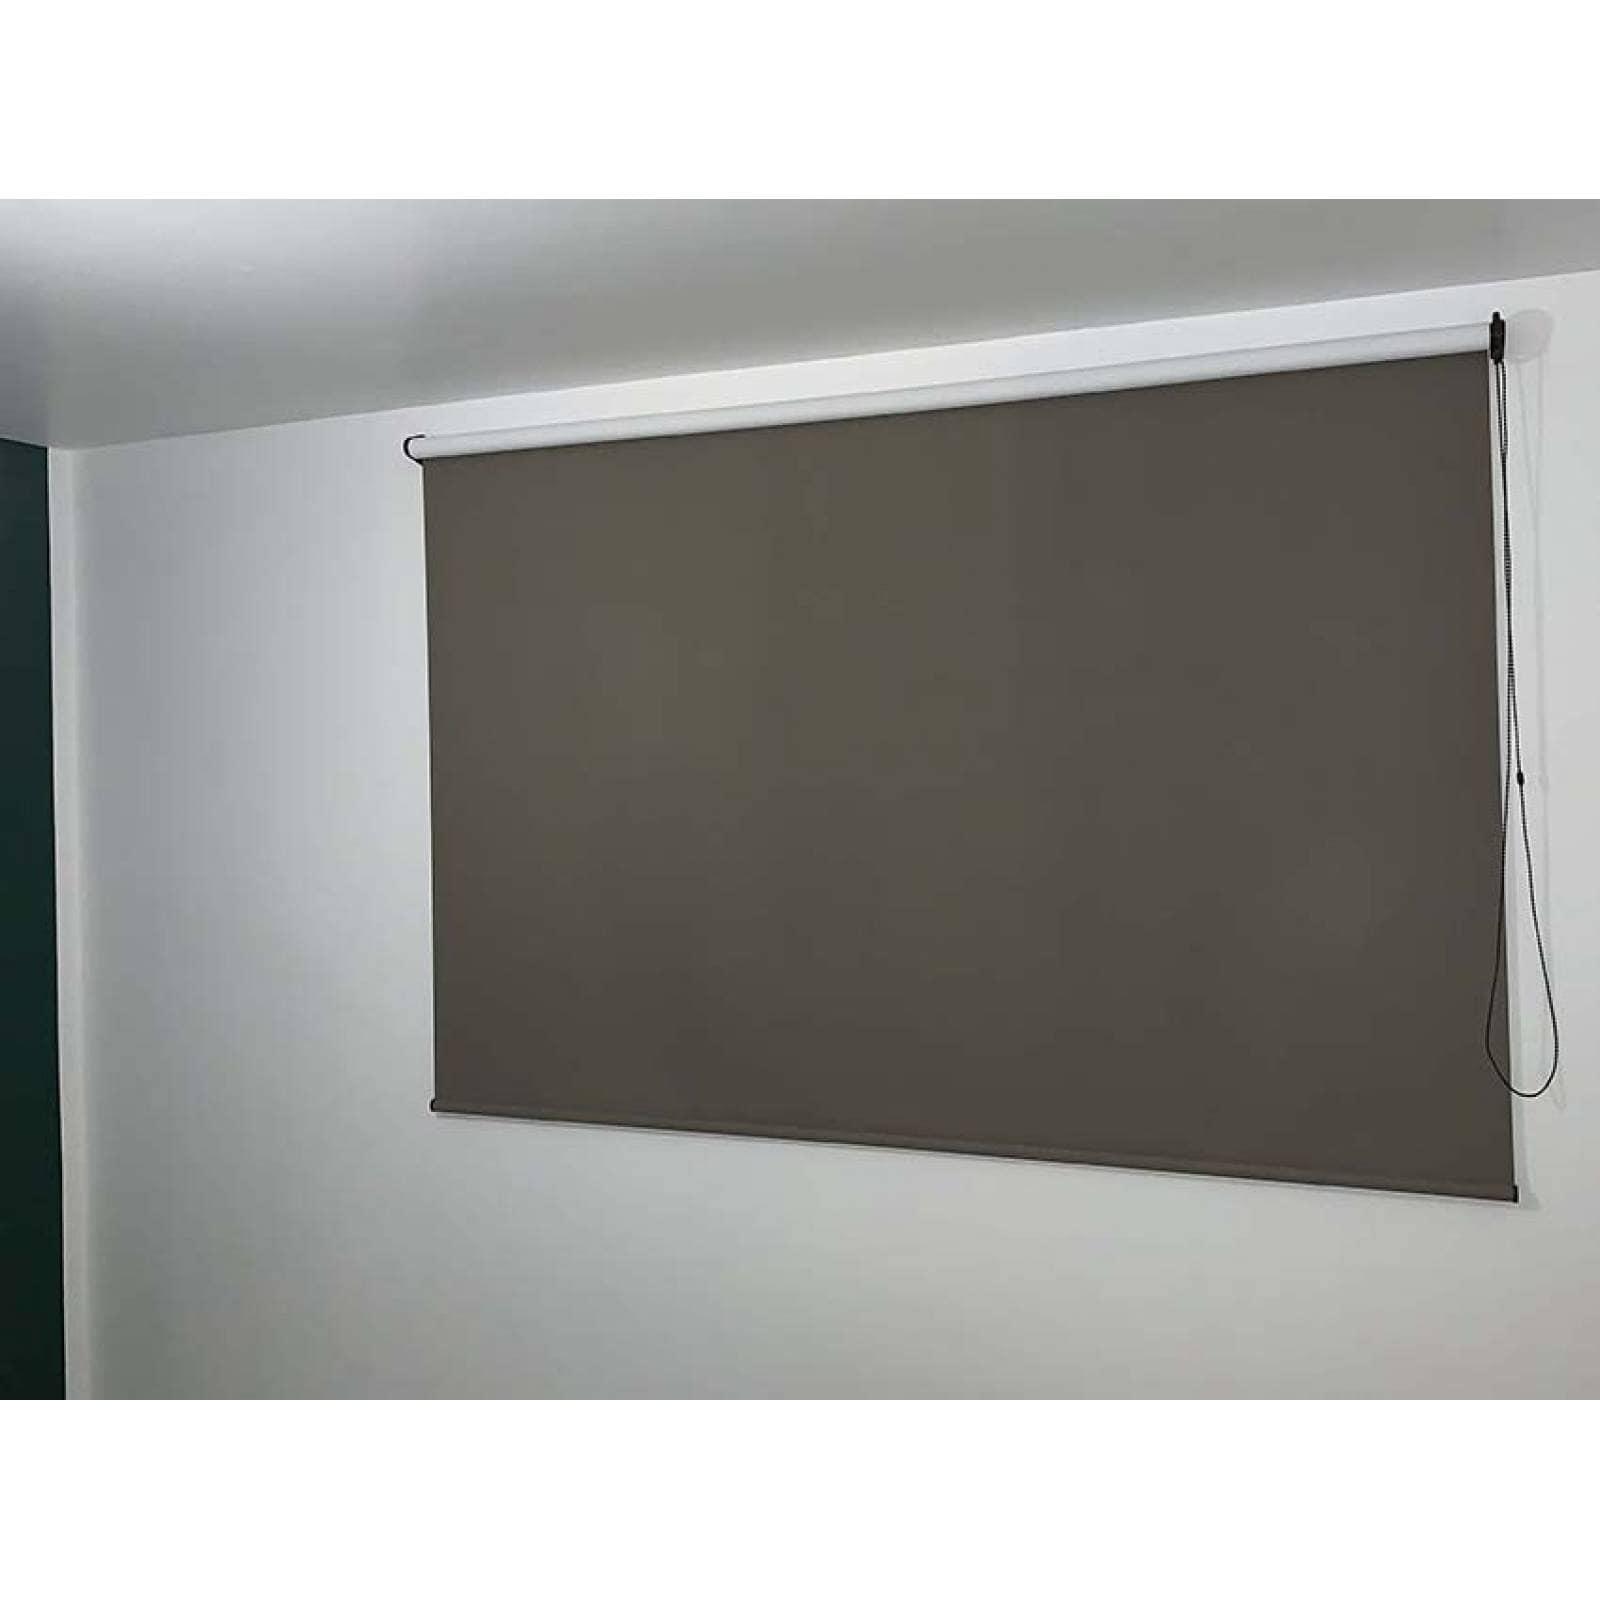 Persianas Blackout modelo Montreal 150 cm de ancho X hasta 230 cm de largo